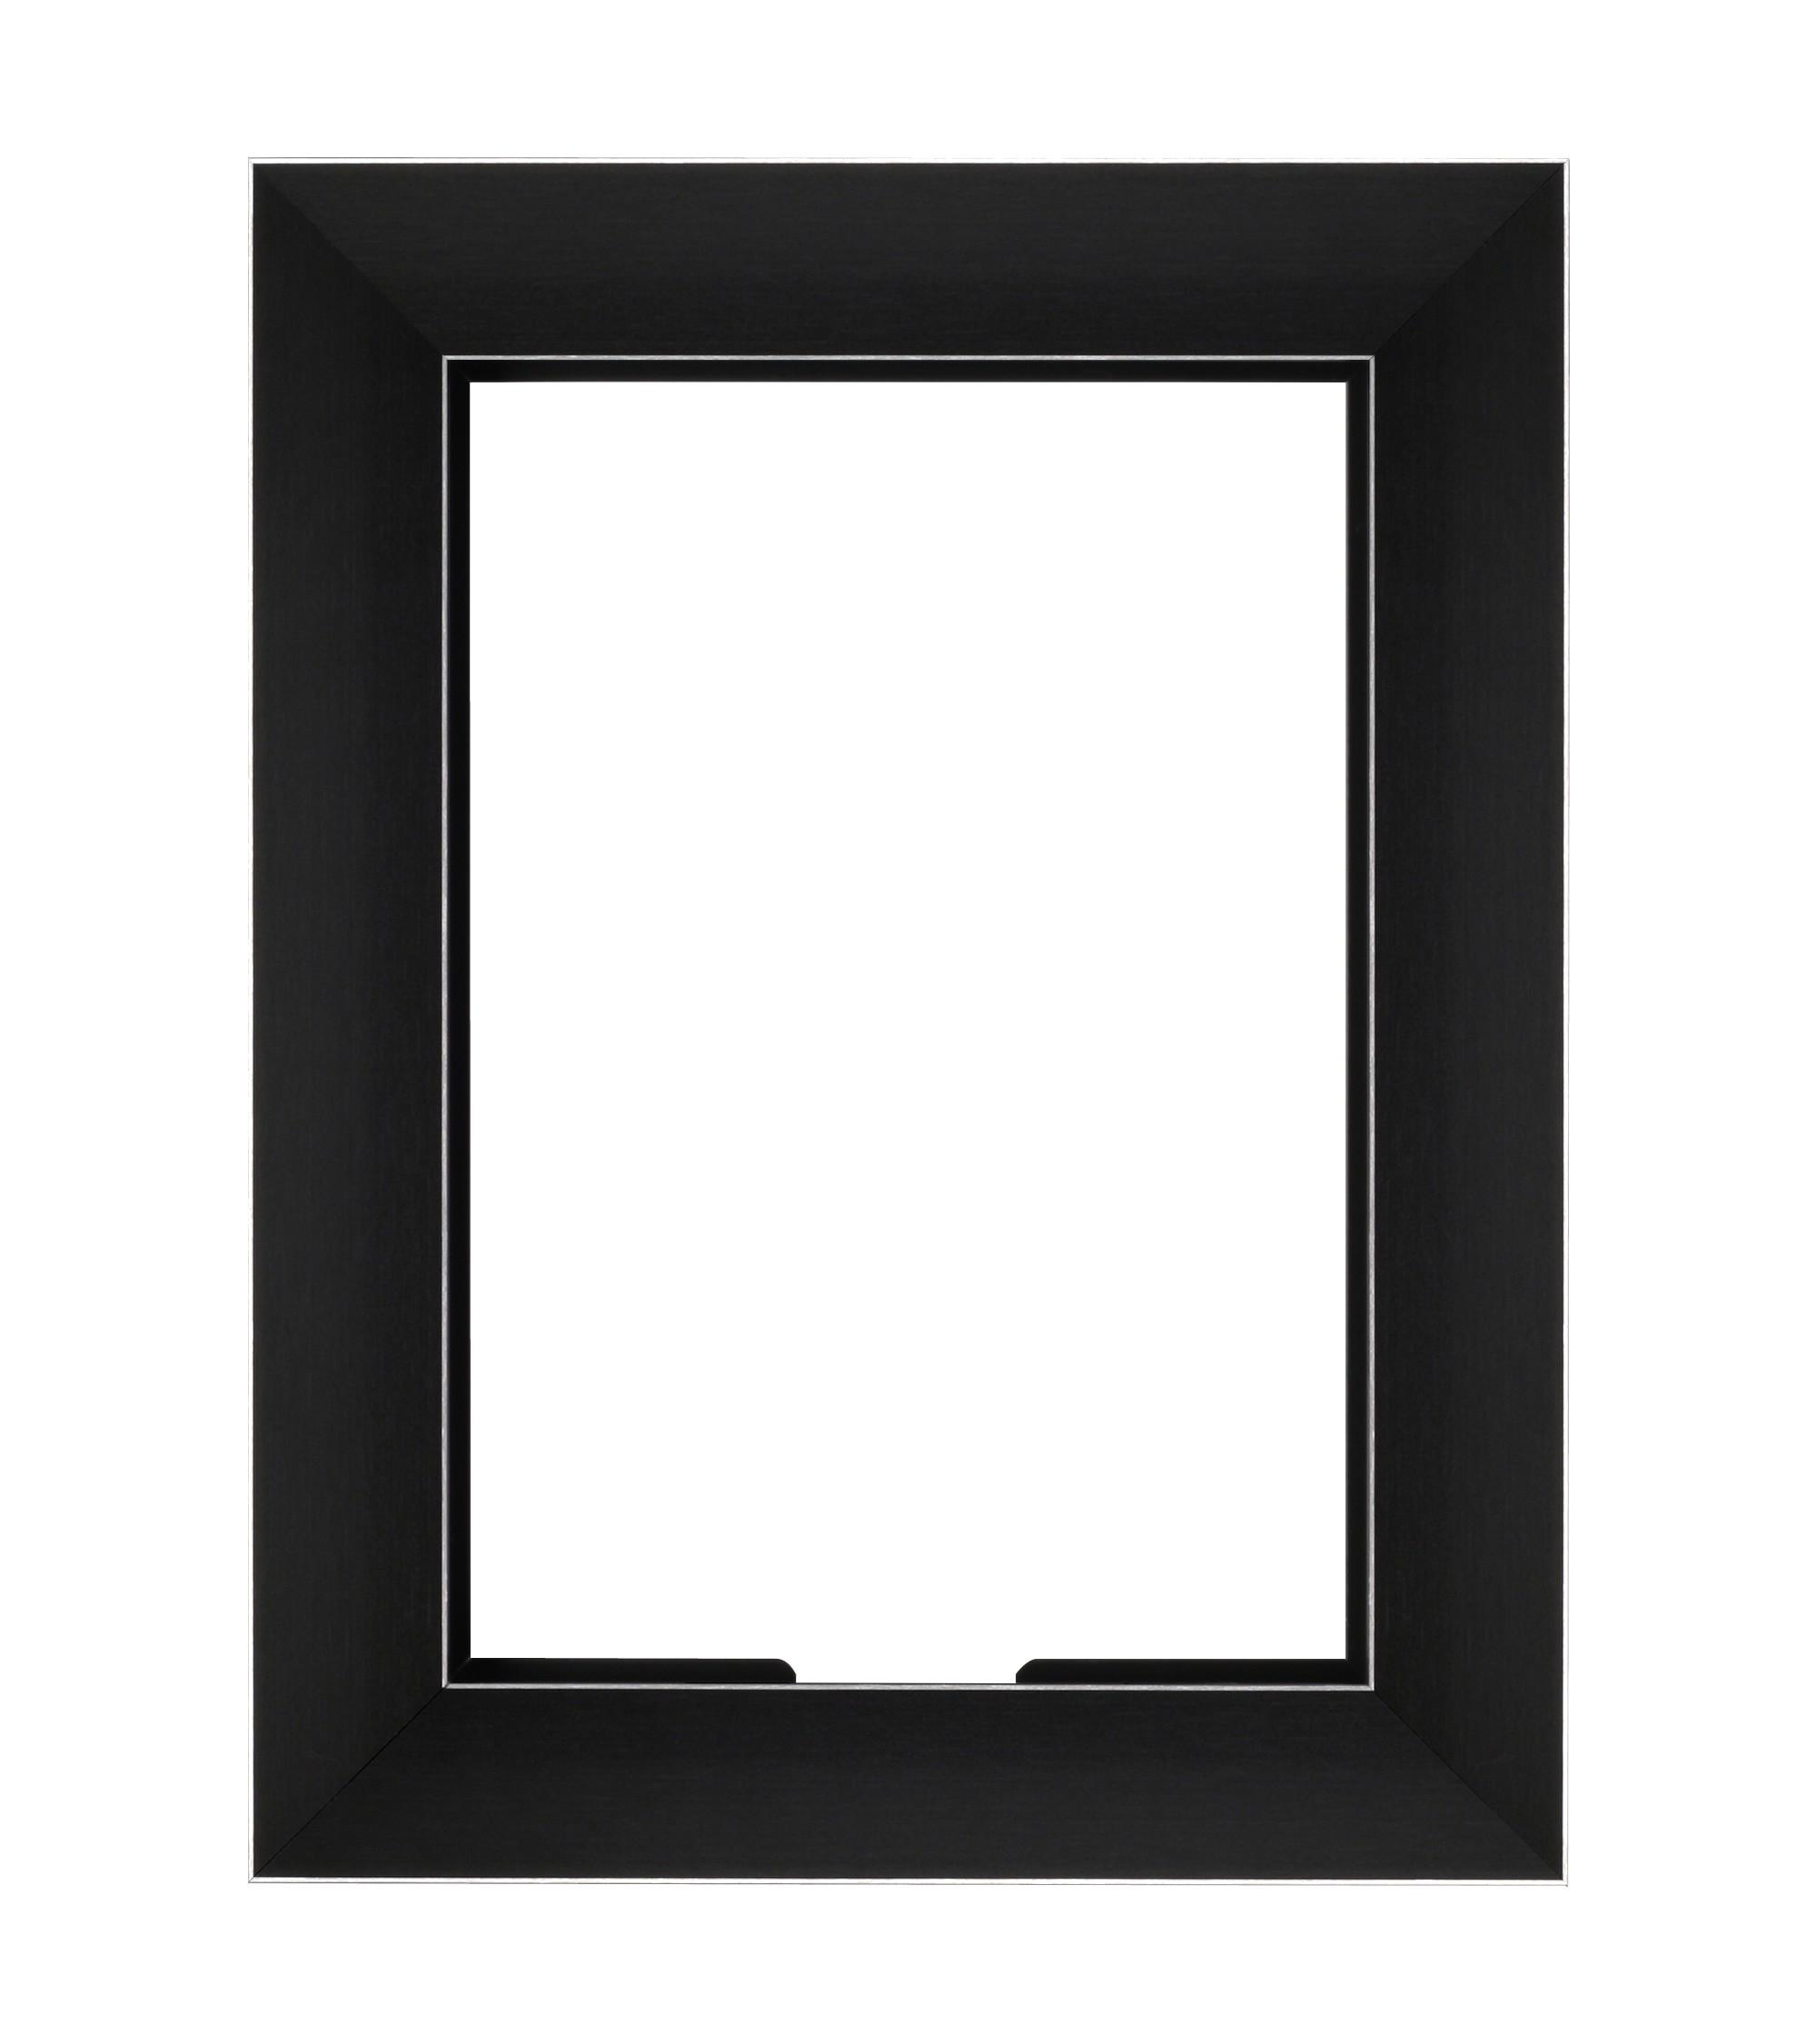 VidaMount iPad Metal On Wall Frame/Enclosure